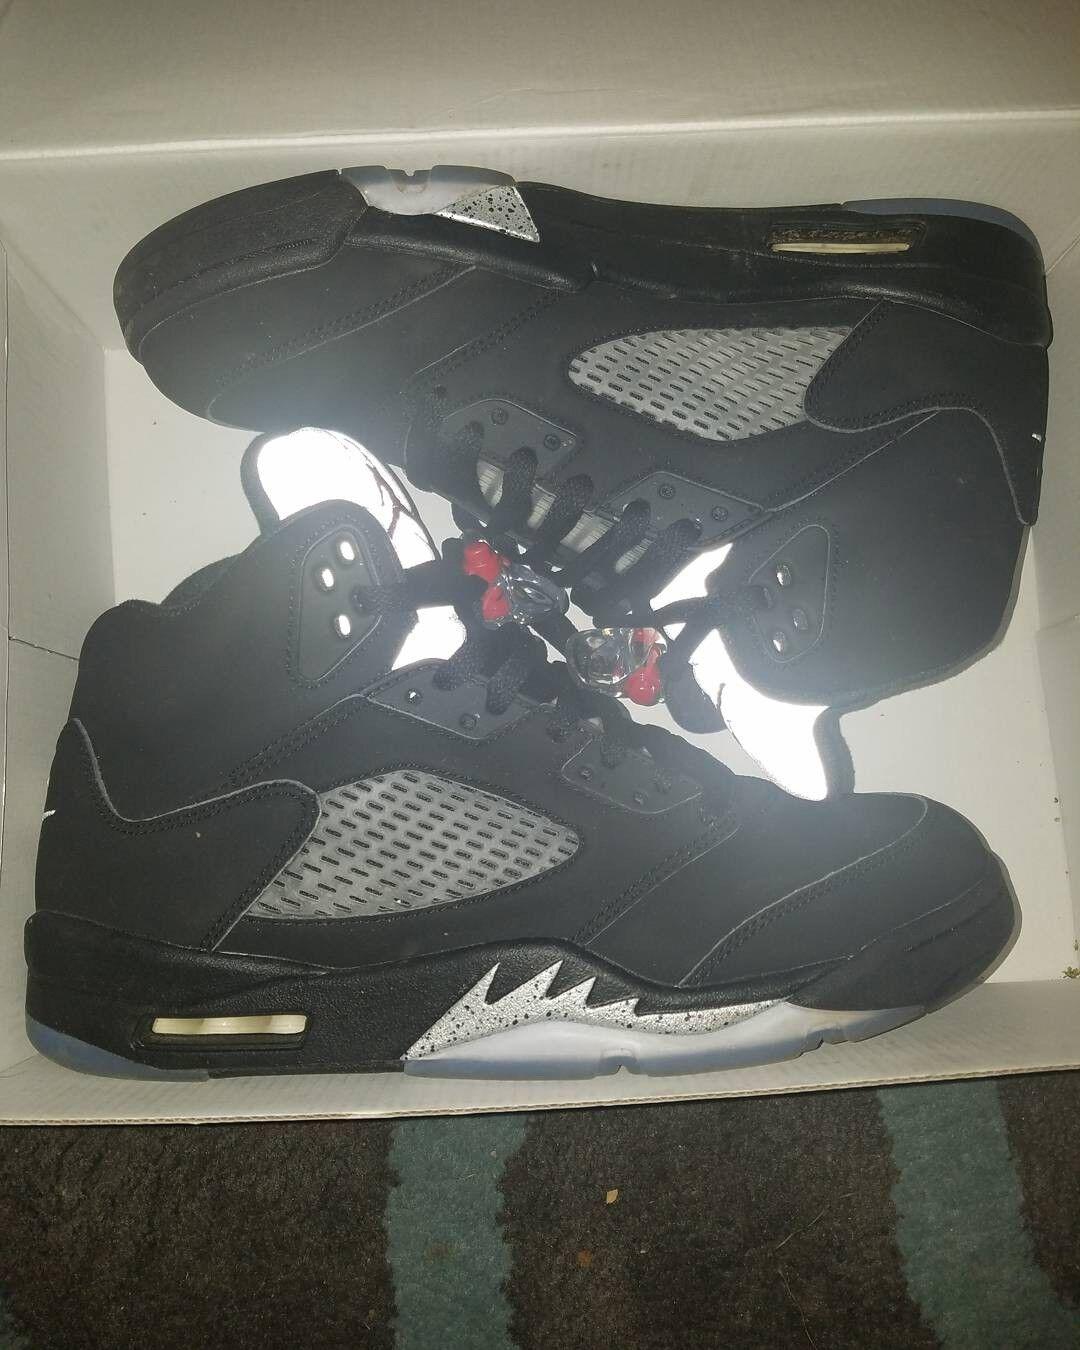 Air Jordan 5 Black/Mettallic Size 10